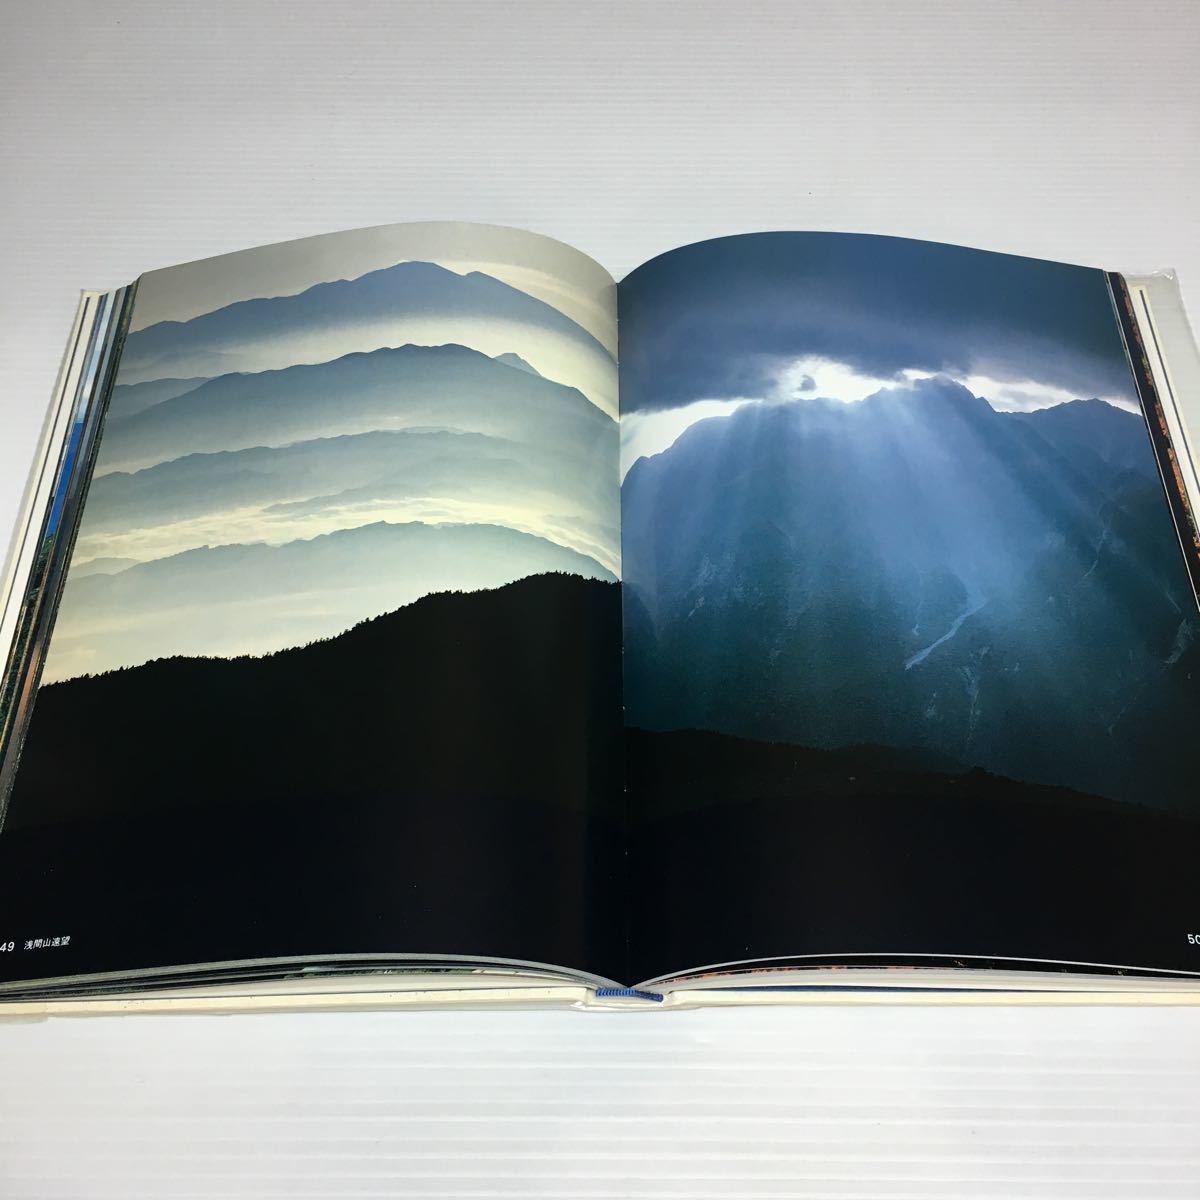 x2/北アルプス 日本山岳写真集団 昭和54年初版 定価8000円_画像8